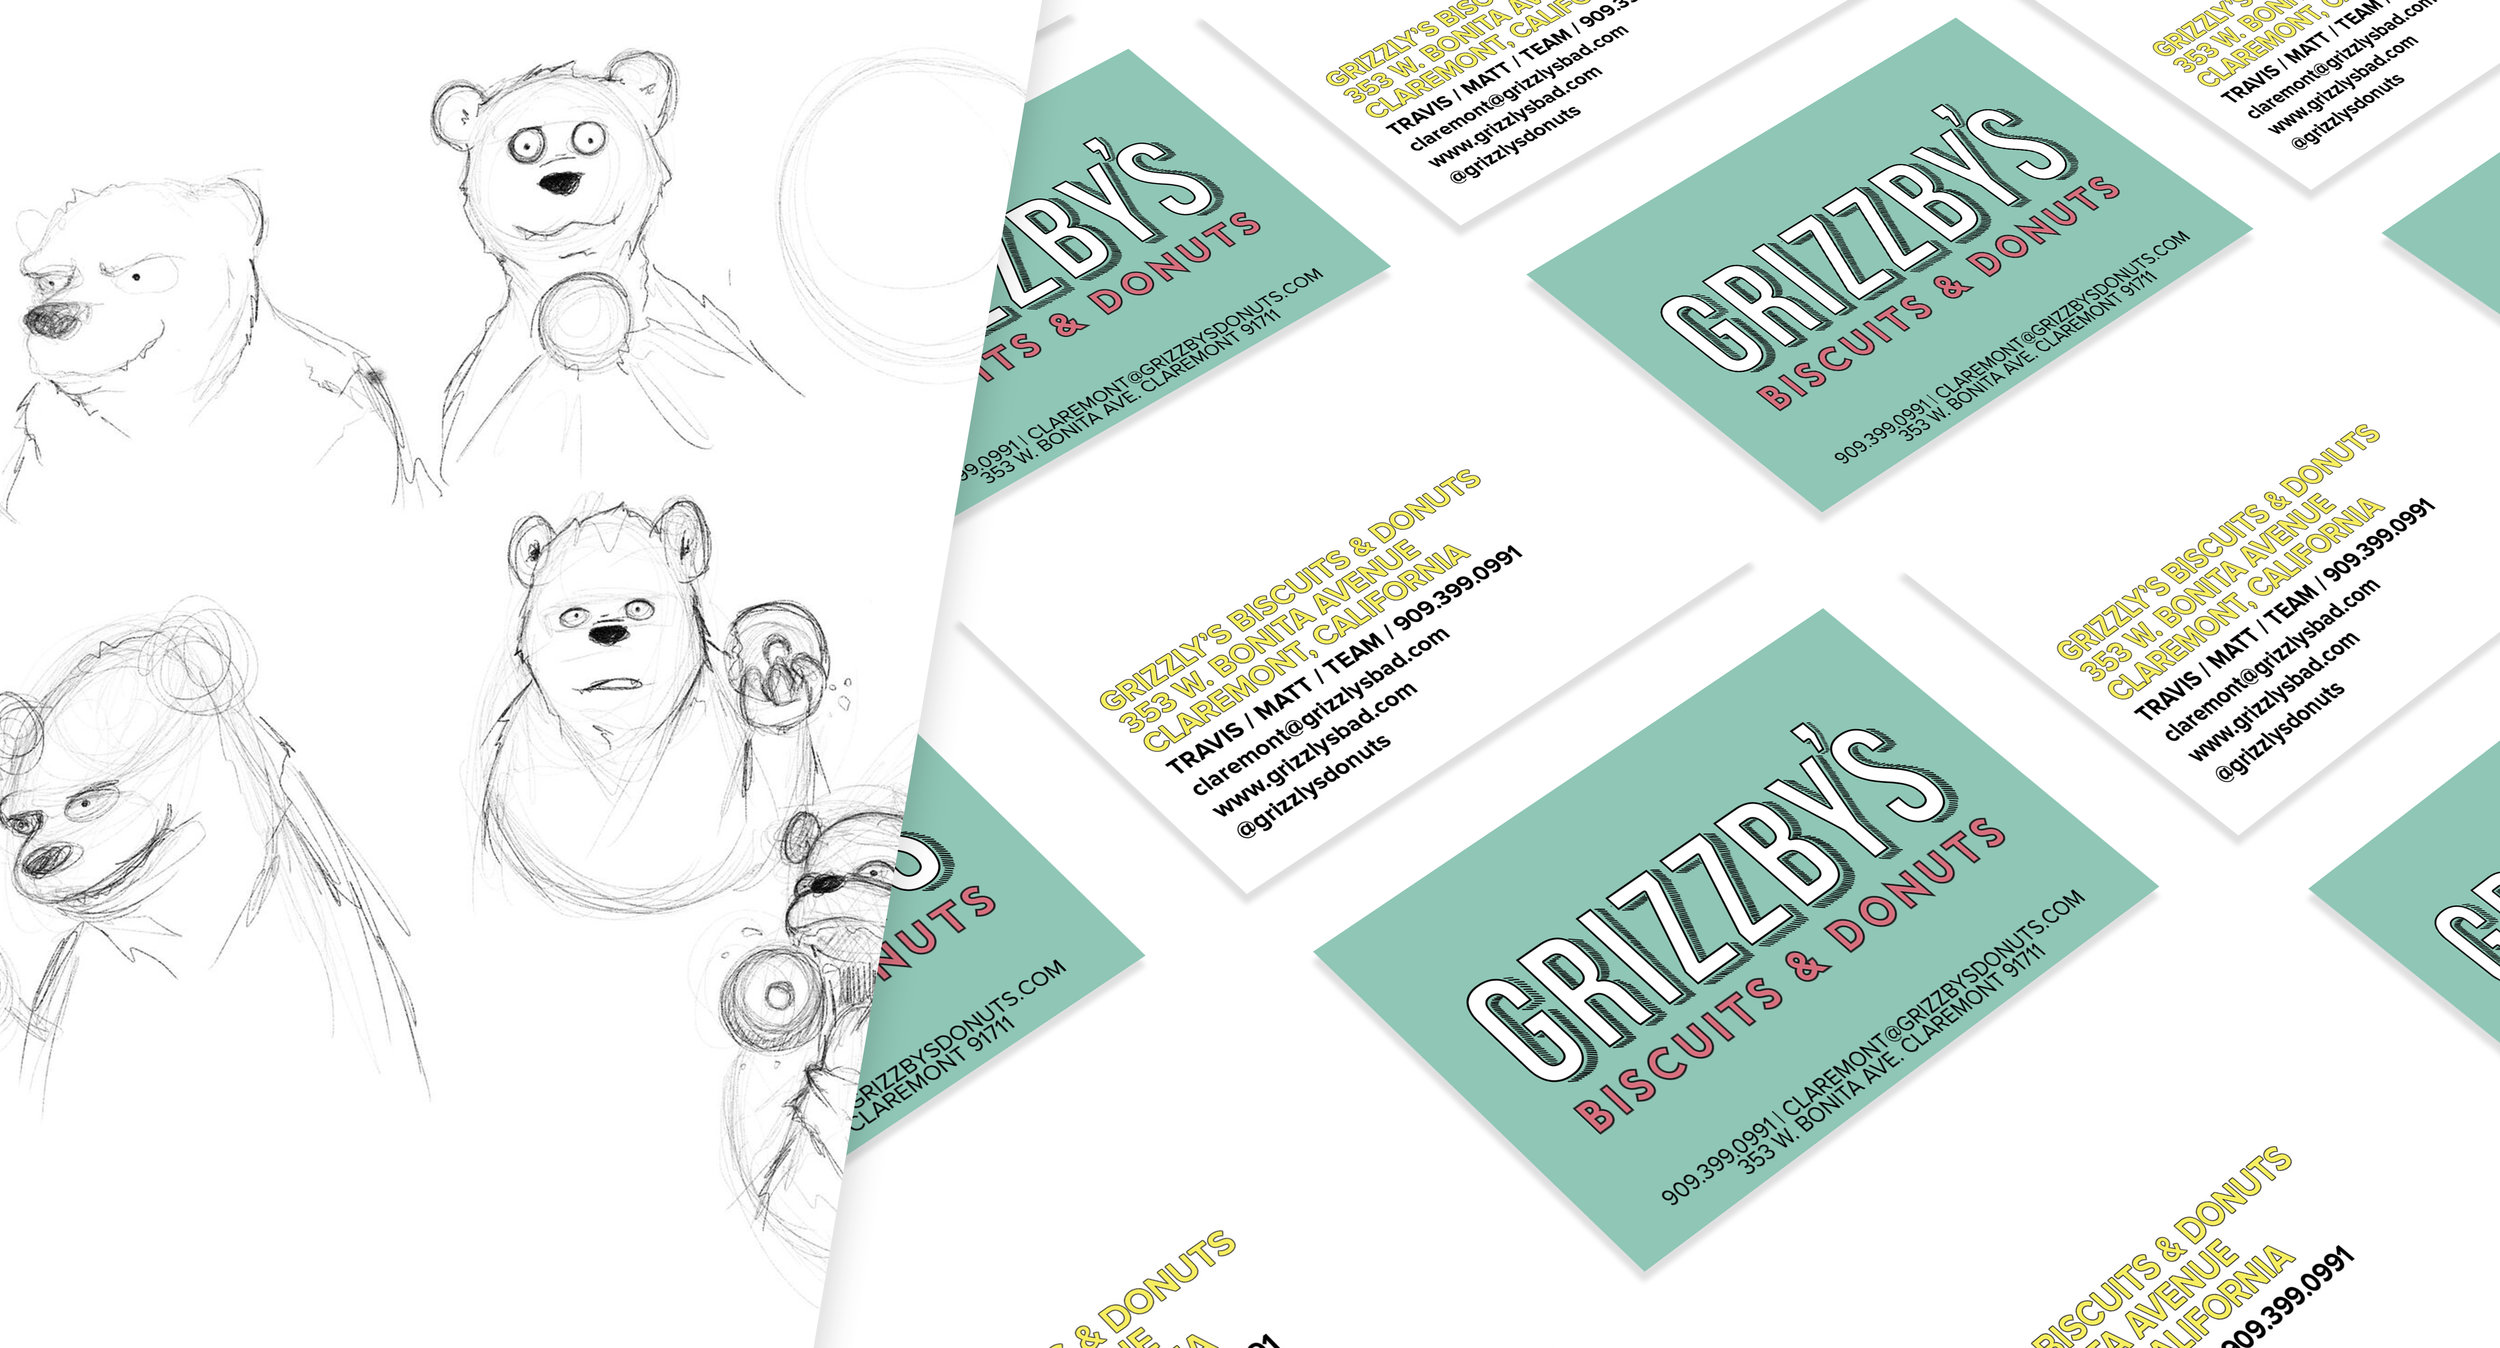 Grizzbys BC_Design-web.jpg